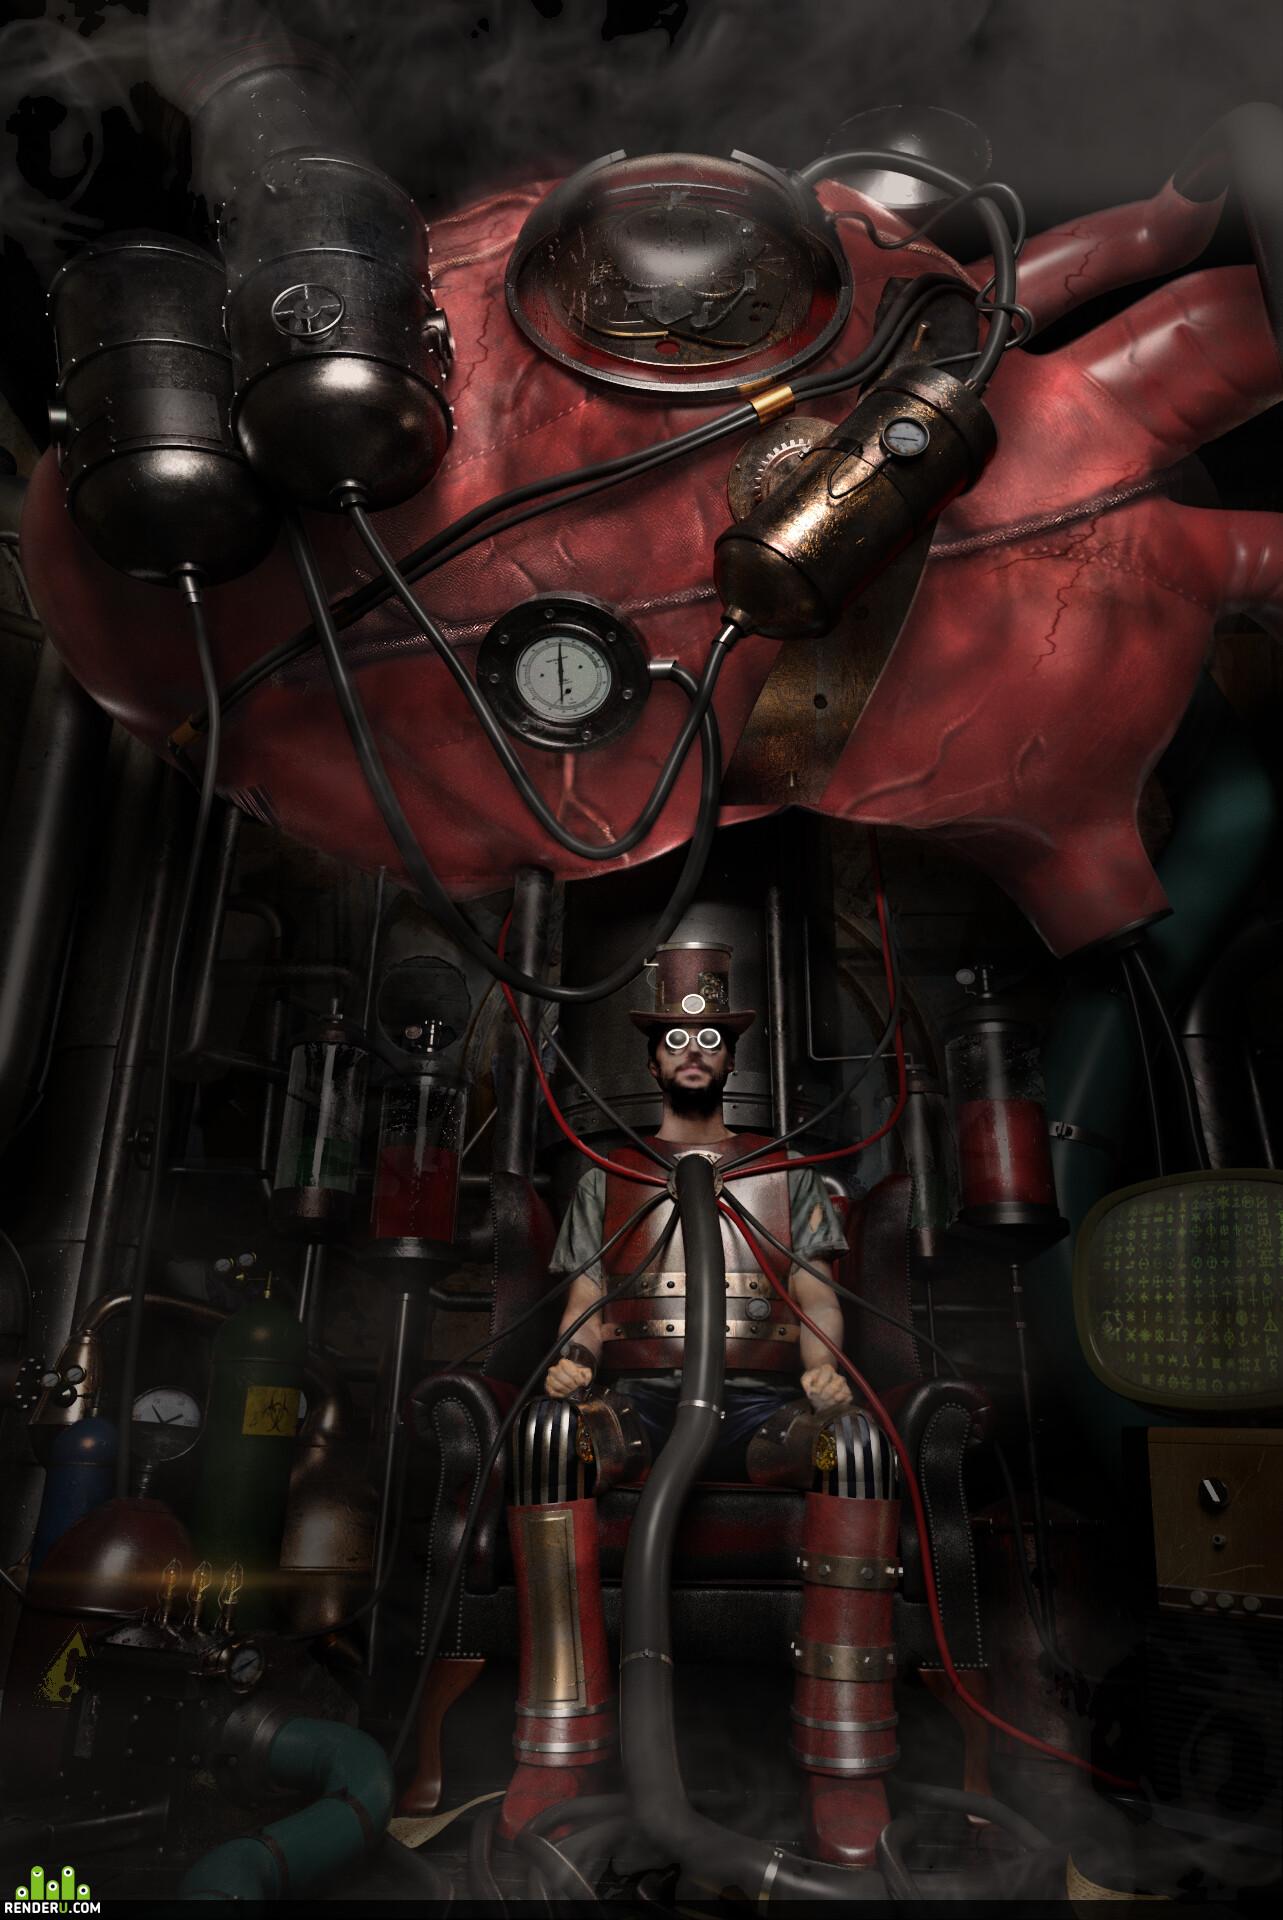 3ds Max, 3dconcept, game concept, concept-art, steam engine, steam punk, coronarender